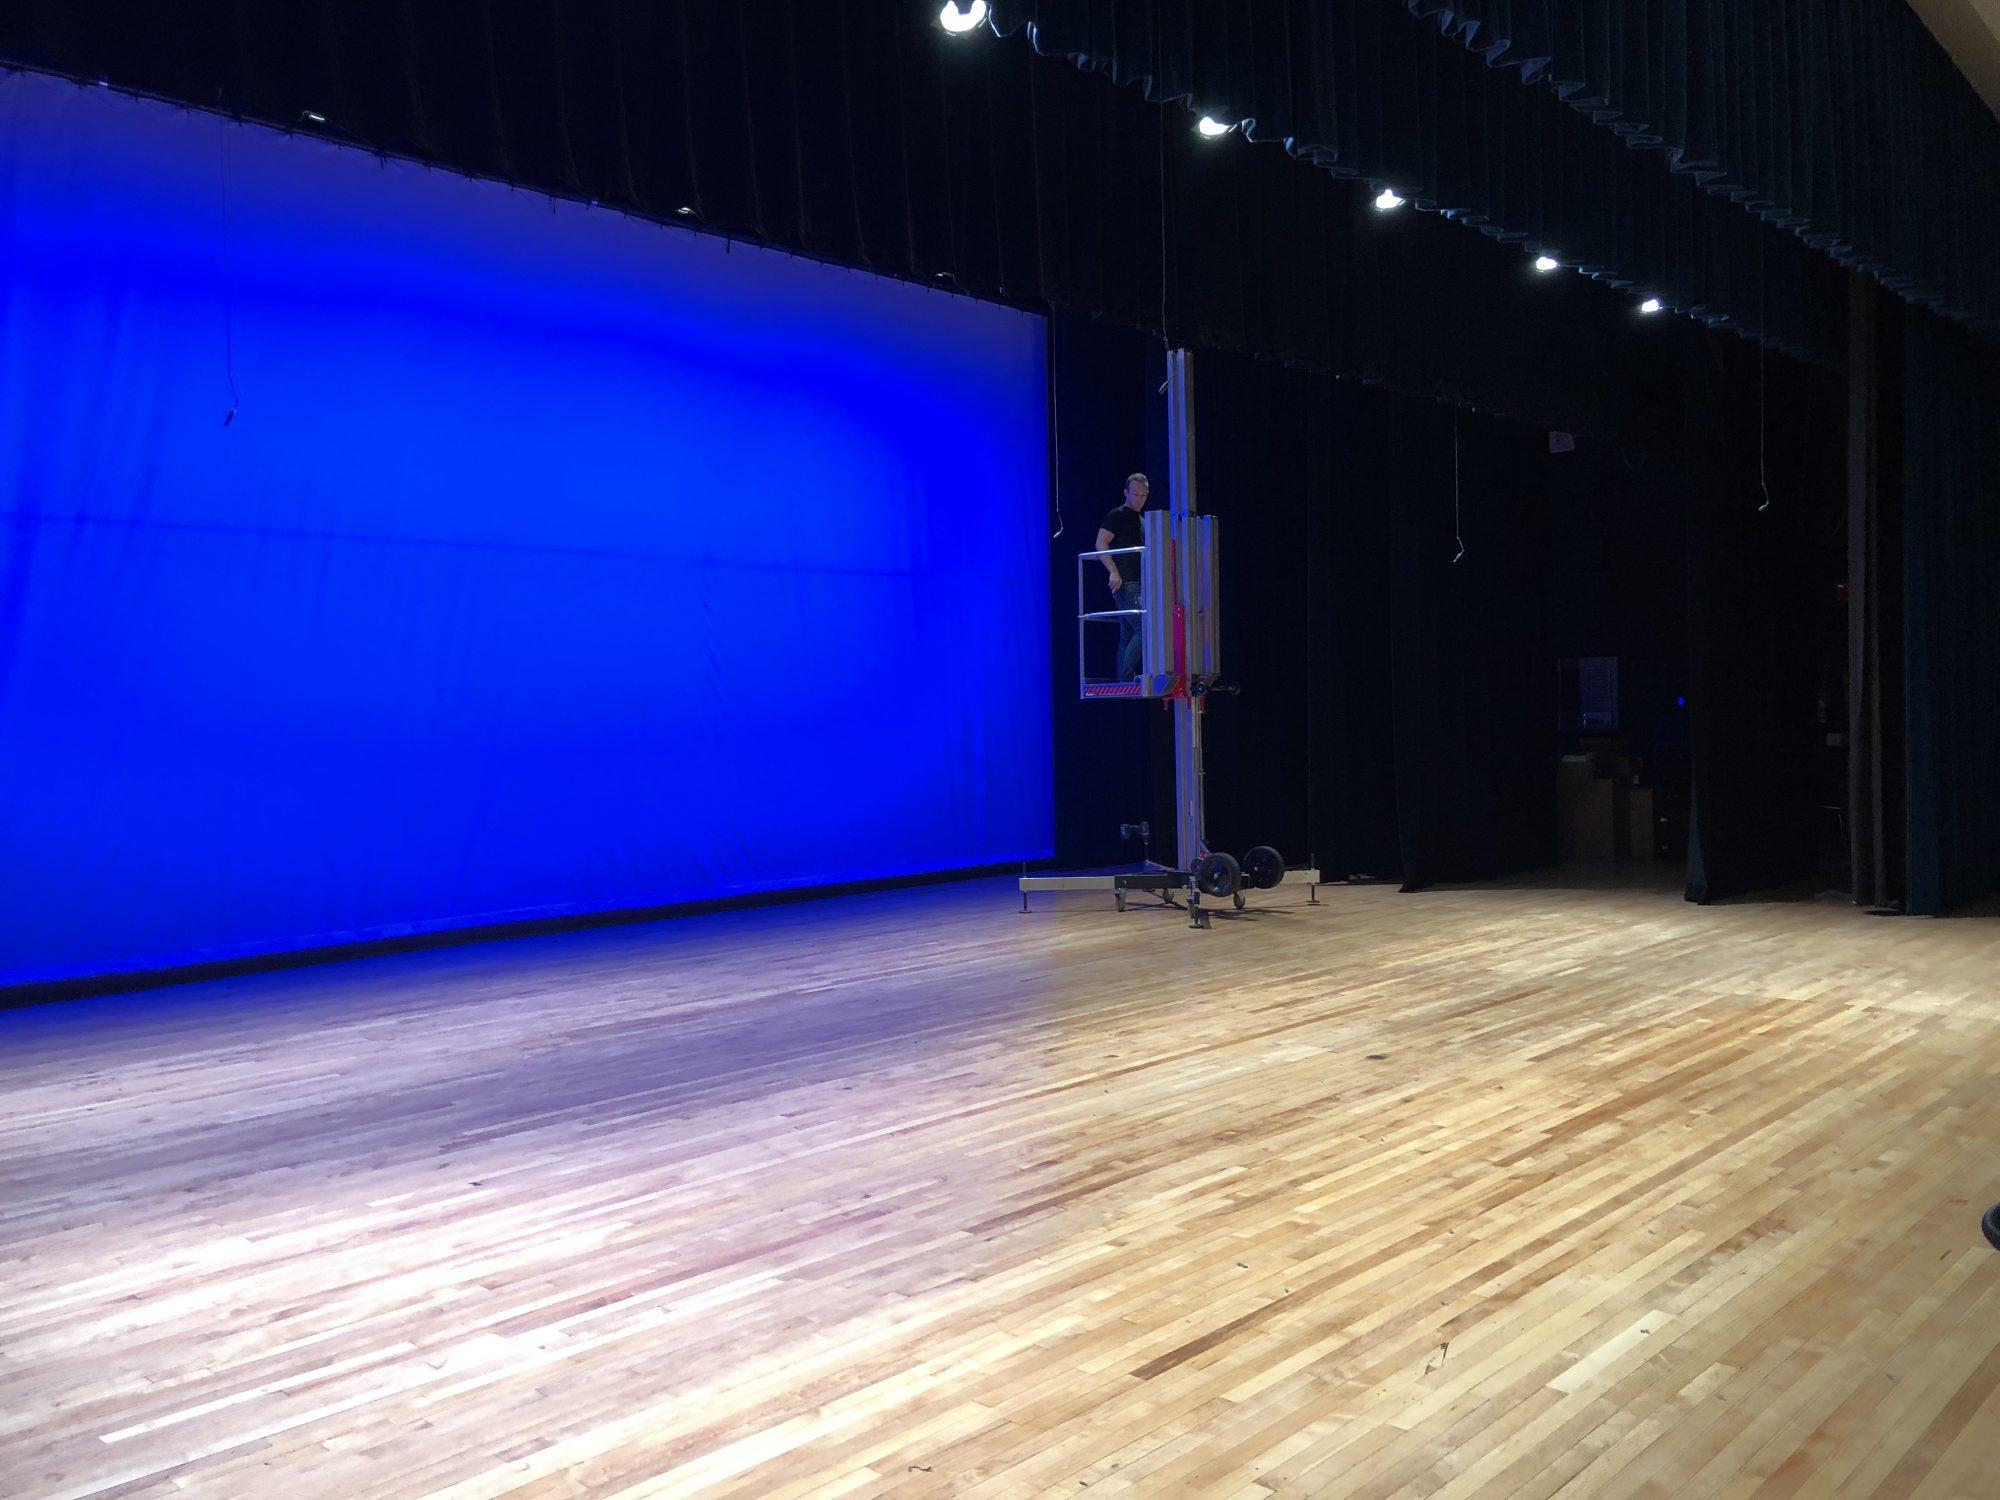 auditorium lighting and stage design